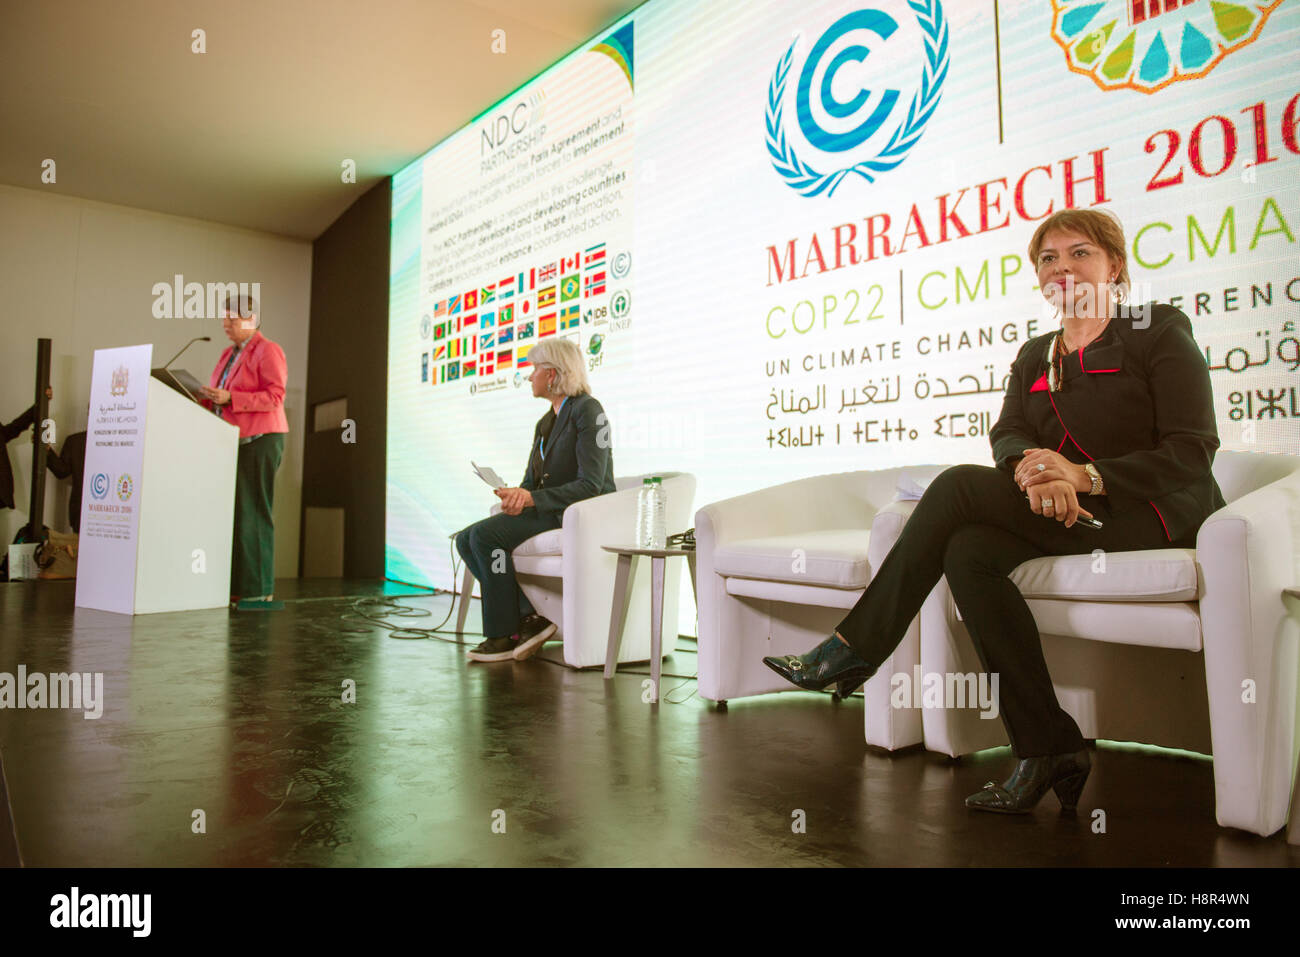 Marrakech, Morocco. 15th Nov, 2016. The German Federal Minister of the Environment Barbara Hendricks, the Moroccan Stock Photo